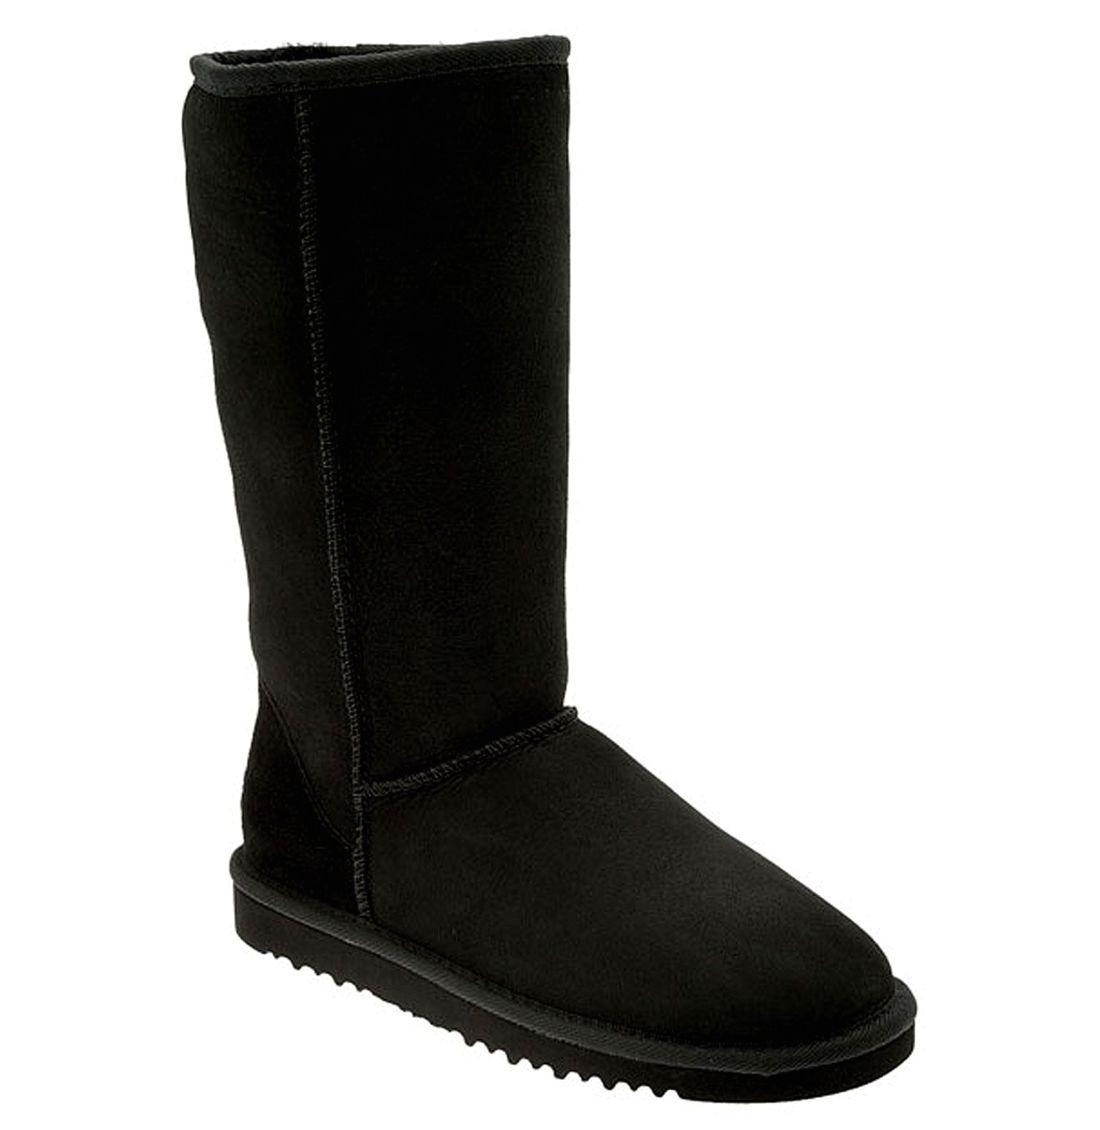 ugga australia classic tall boot